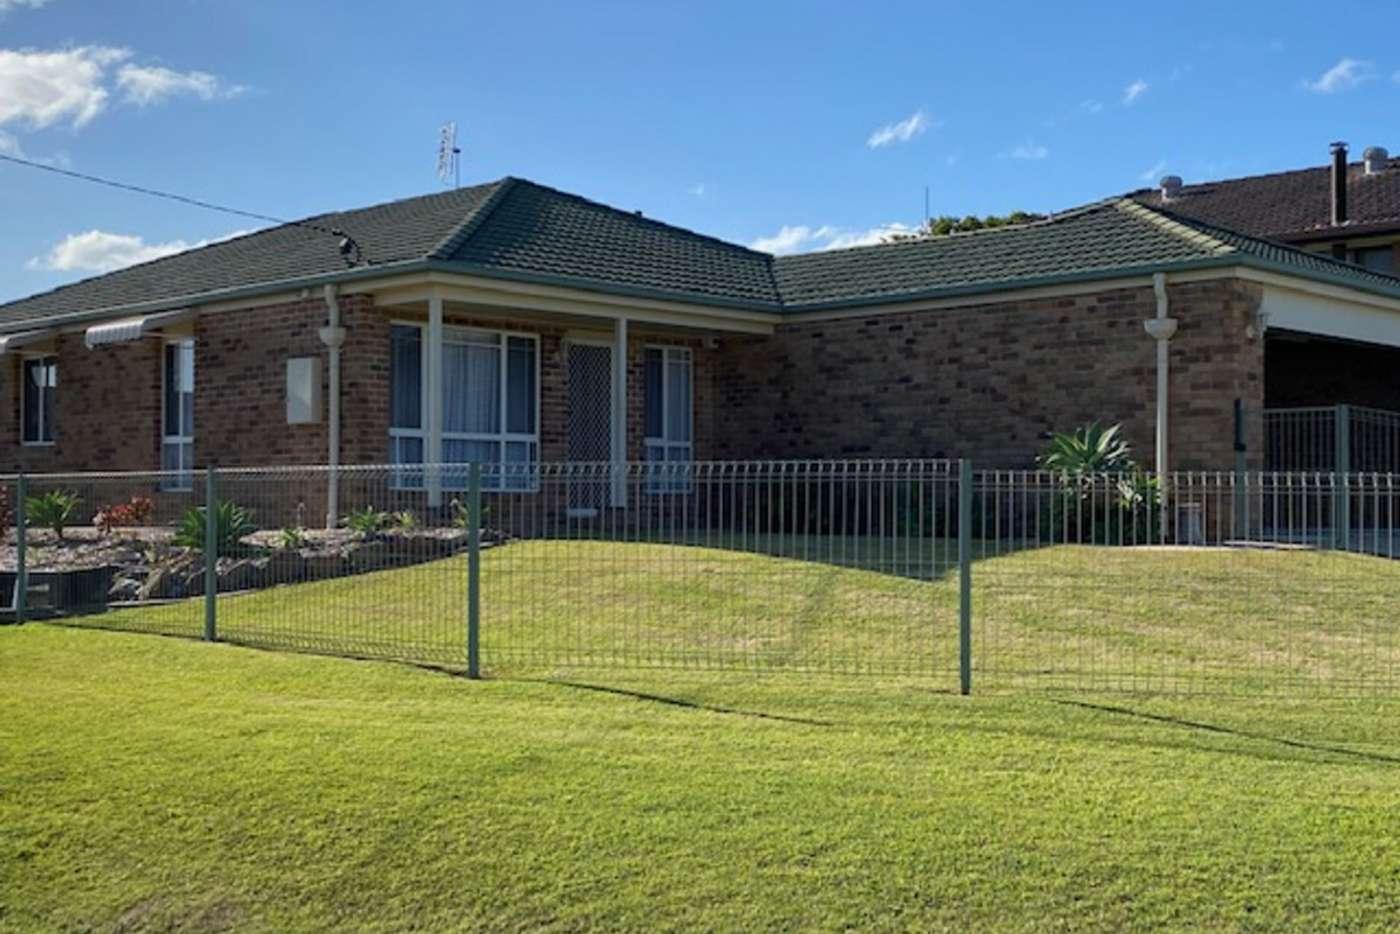 Main view of Homely house listing, 45 Warana Avenue, Steiglitz QLD 4207